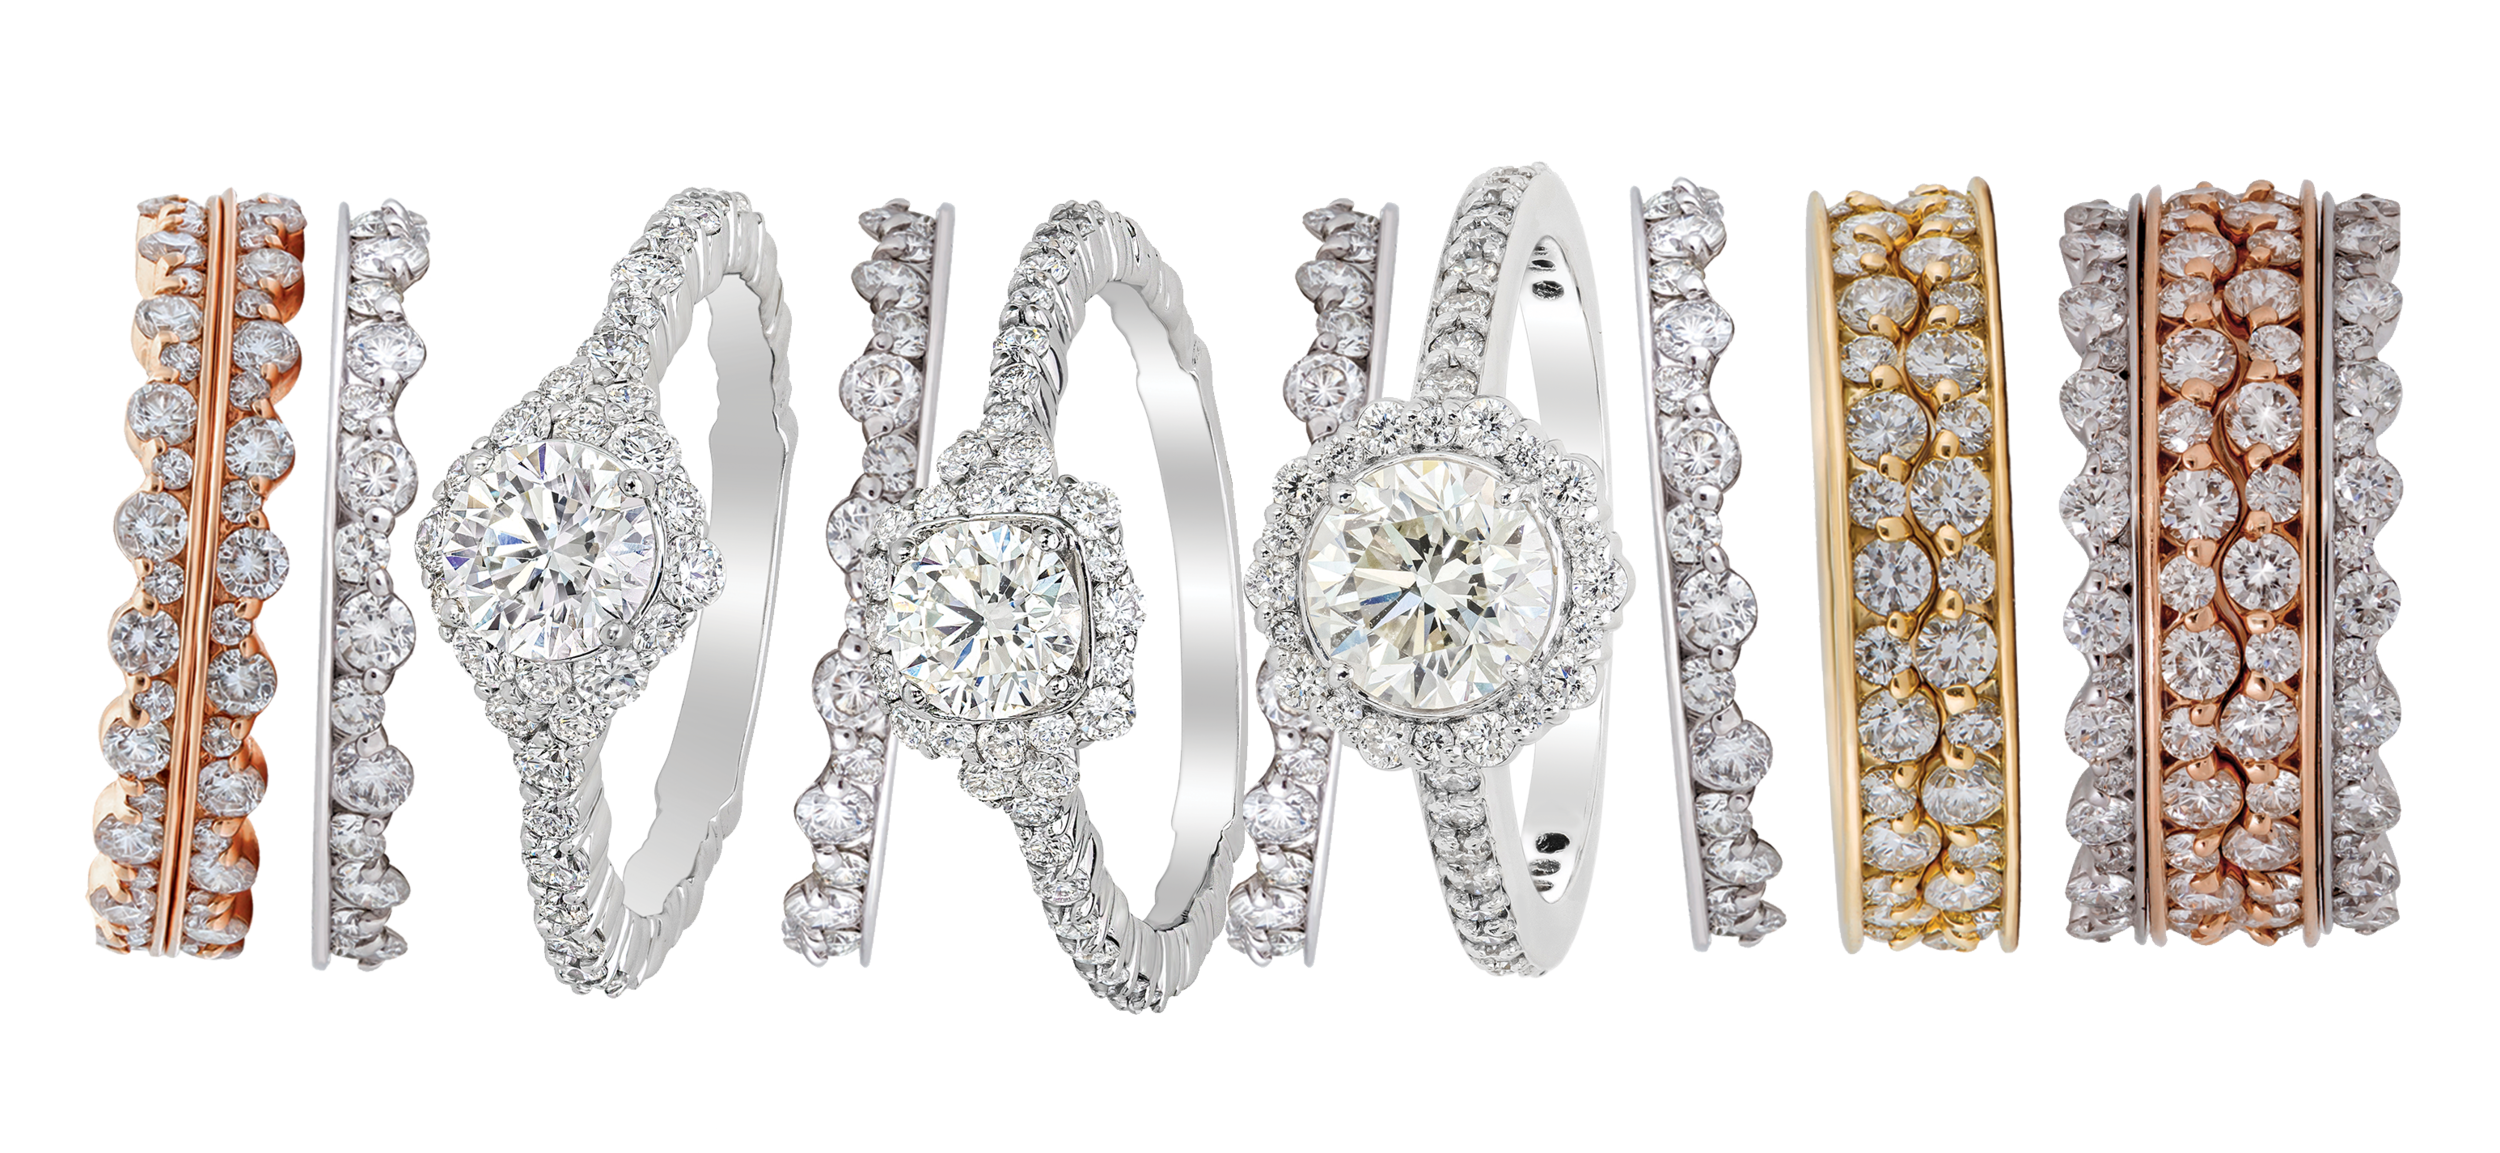 Integré Diamond Jewellery - Award-Winning Designs by Ron Rizzo for Pluczenik